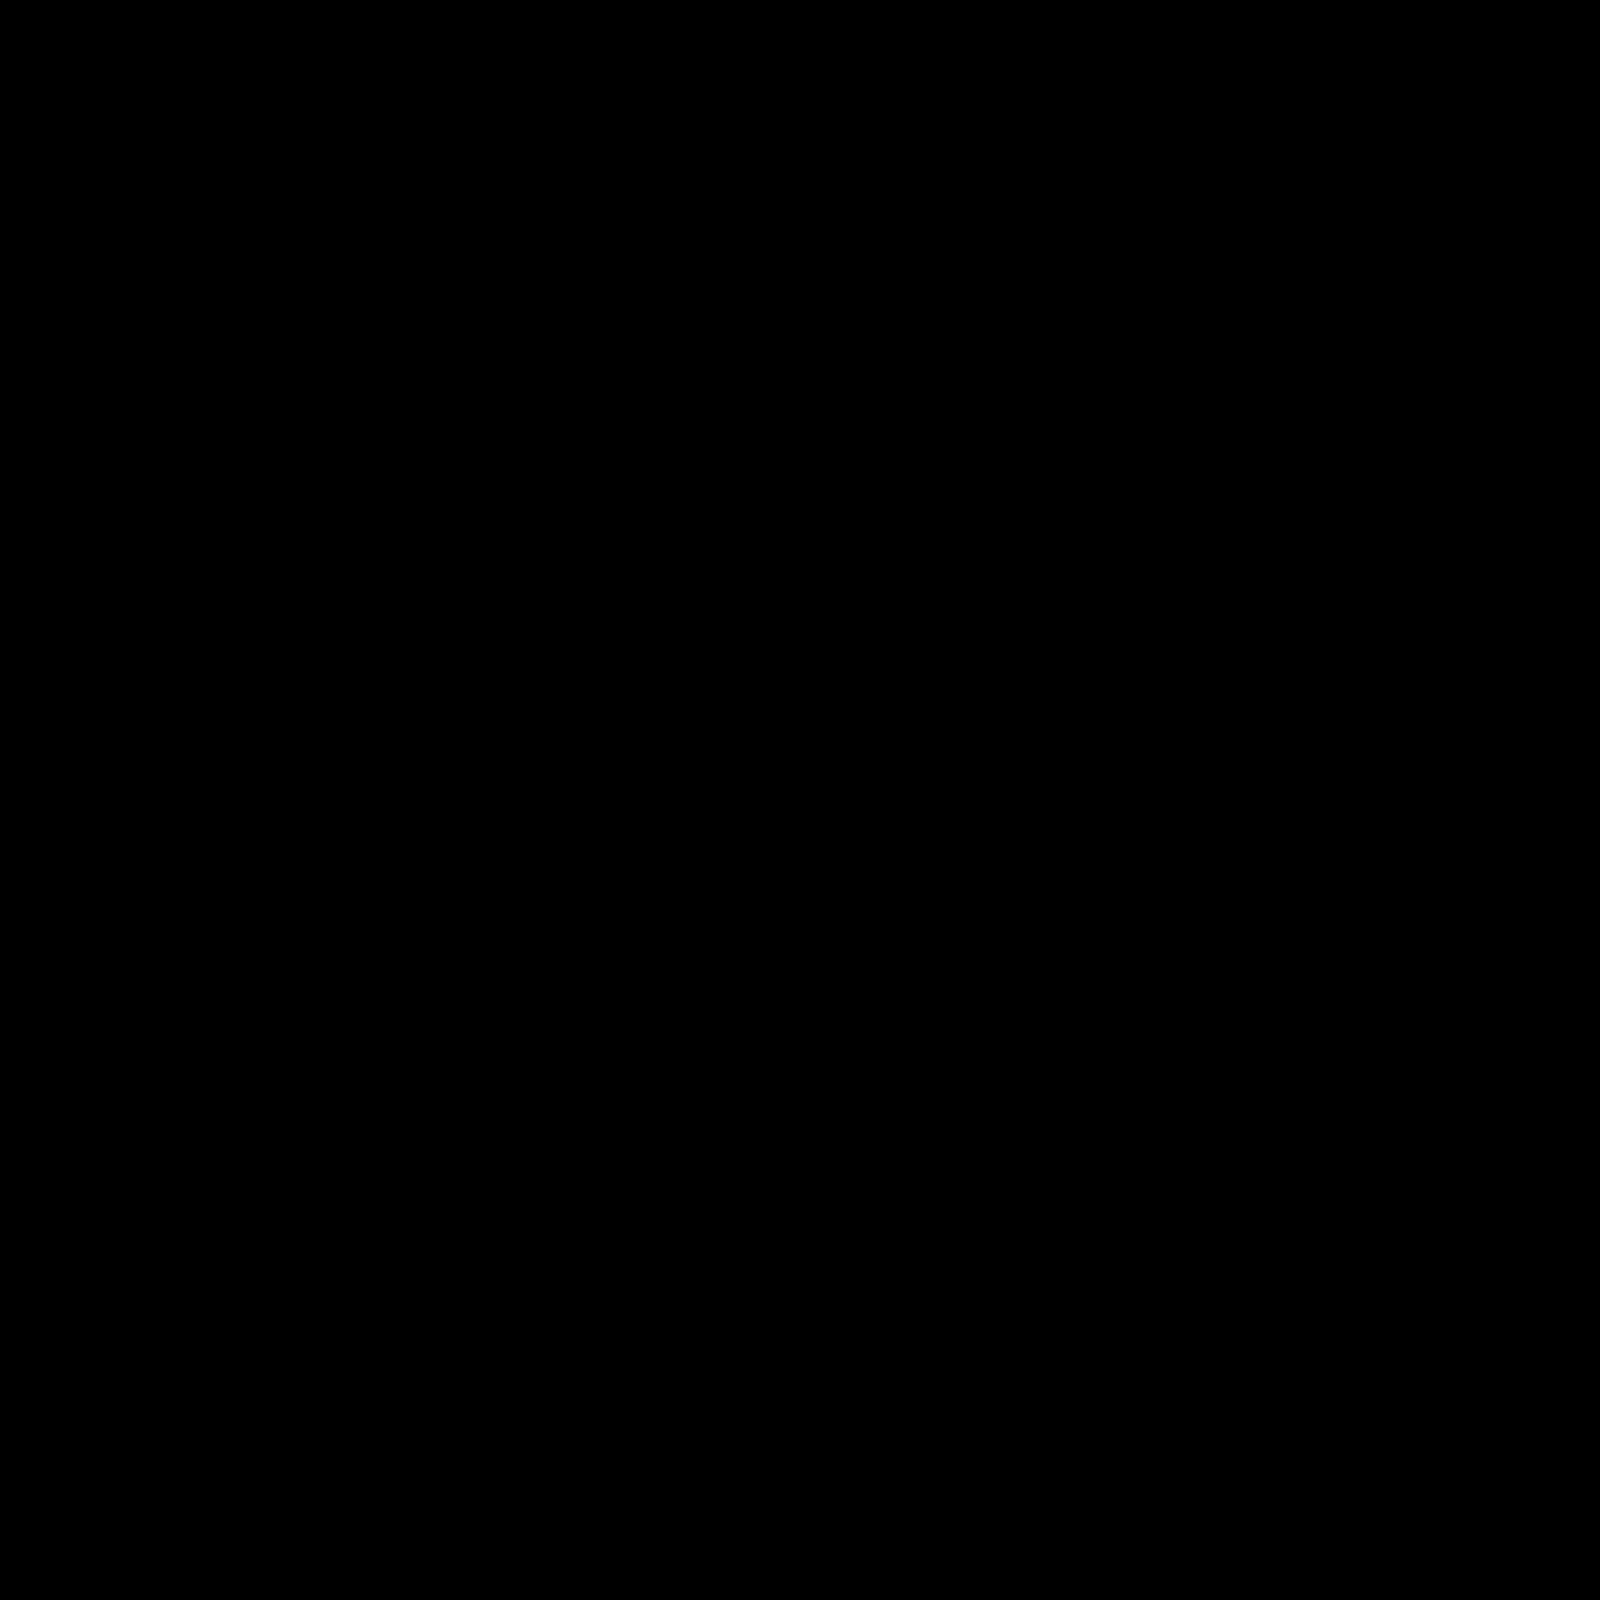 Żarówka okrągła icon. It's a logo of Globe Bulb reduced to a light bulb. This logo has a dark outline and looks like an ordinary white bulb, pretty much like the logo on Globe Bulb.